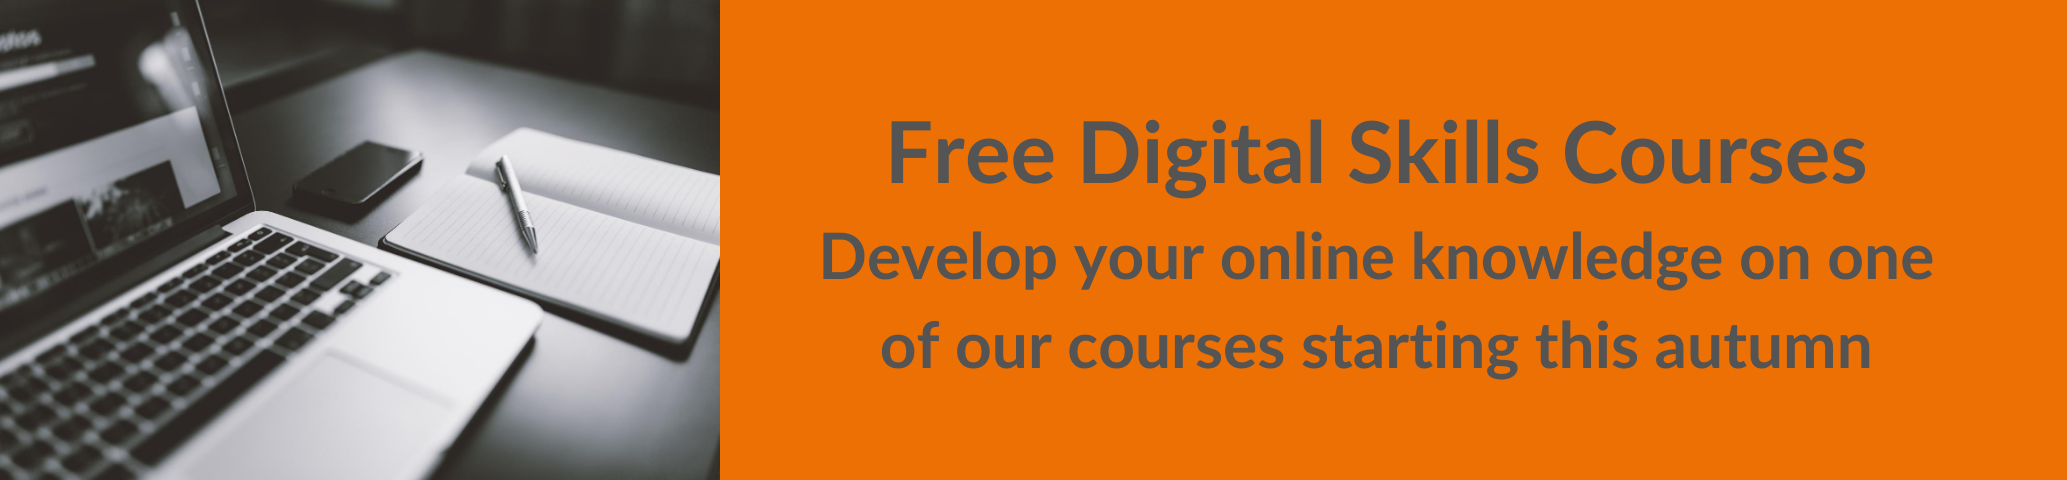 Digital Skills Banner